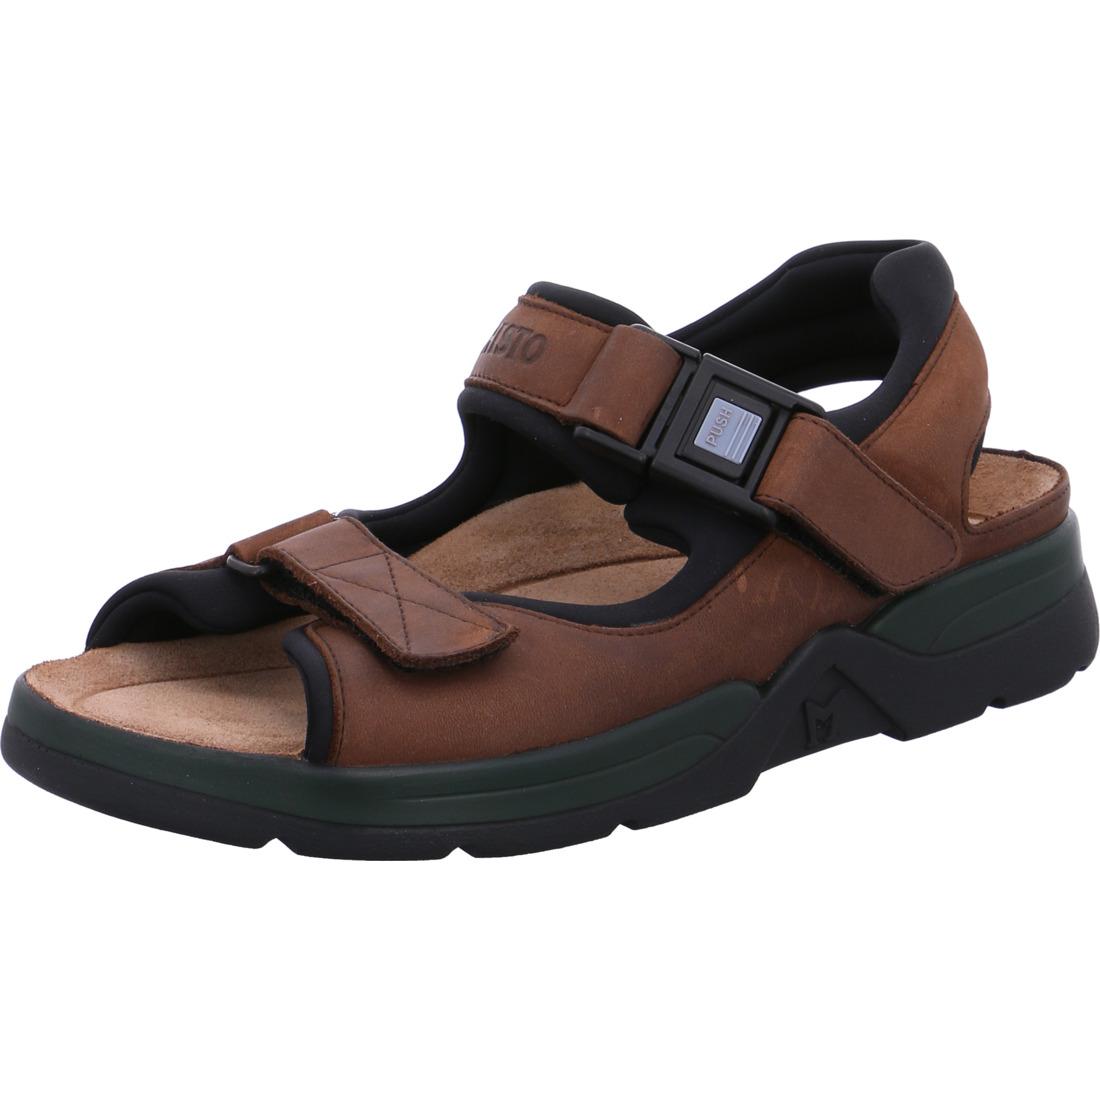 mephisto herren sandale atlas sandalen herren mephisto shop. Black Bedroom Furniture Sets. Home Design Ideas